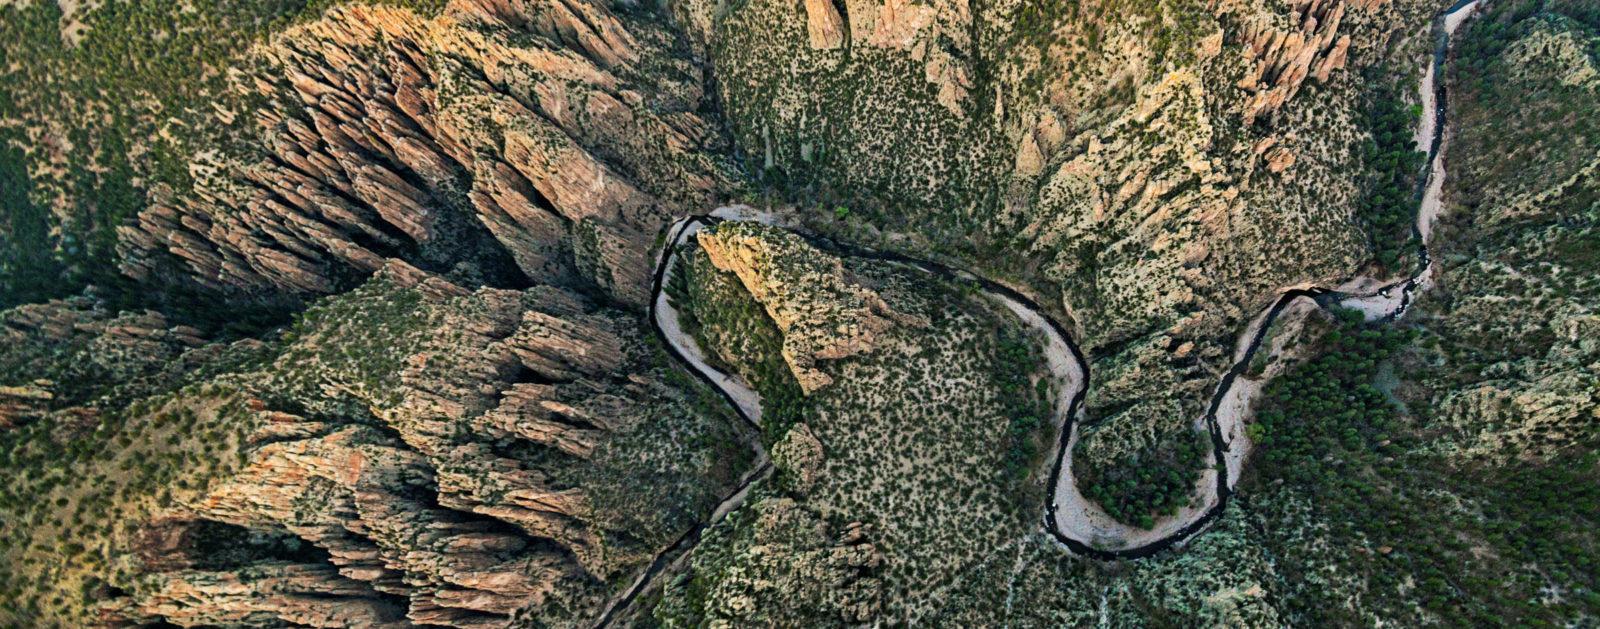 Gila River, NM | Photo by Michael Melford